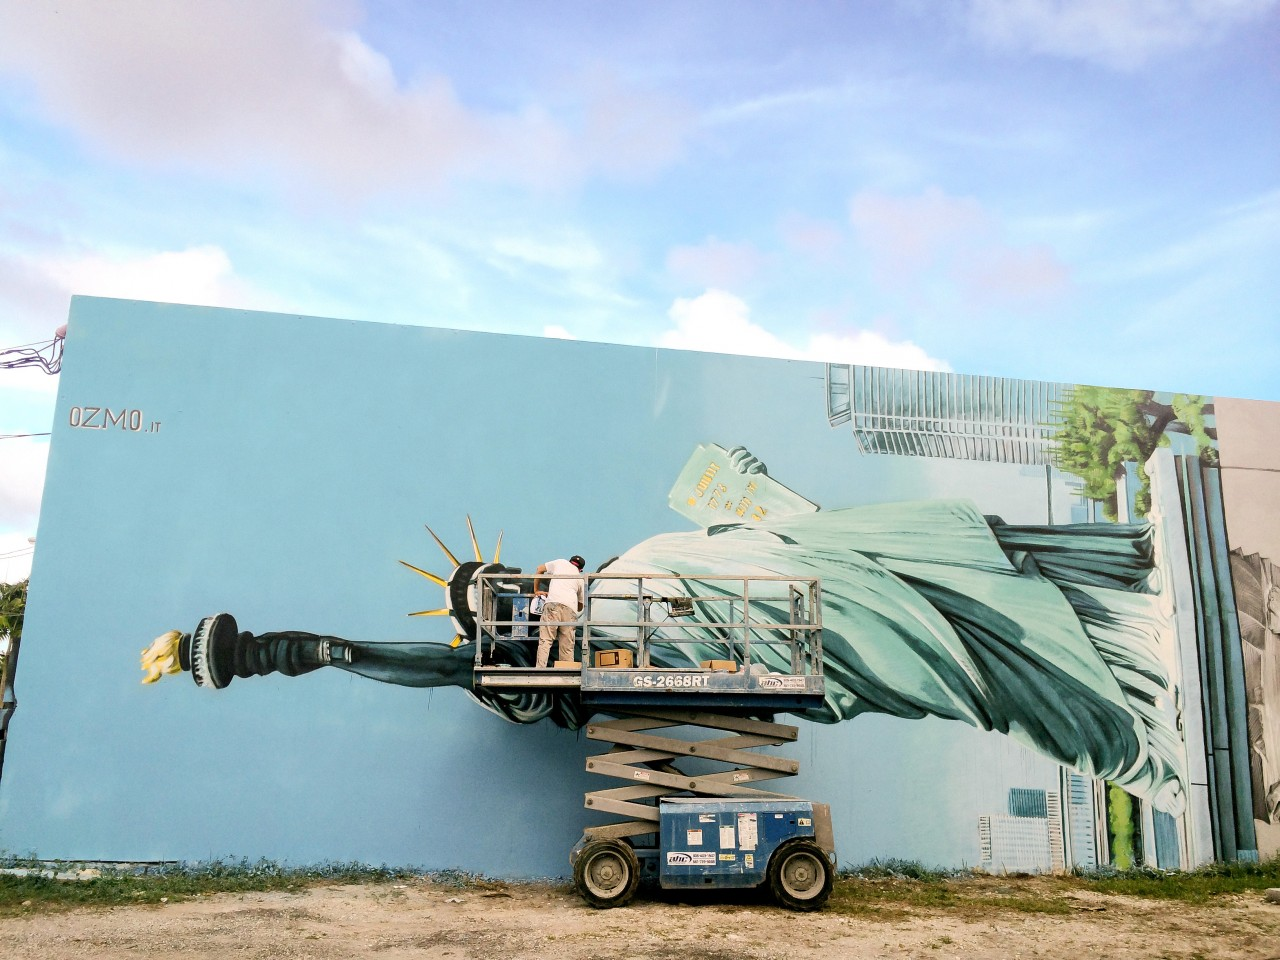 ozmo-new-mural-in-wynwood-miami-02